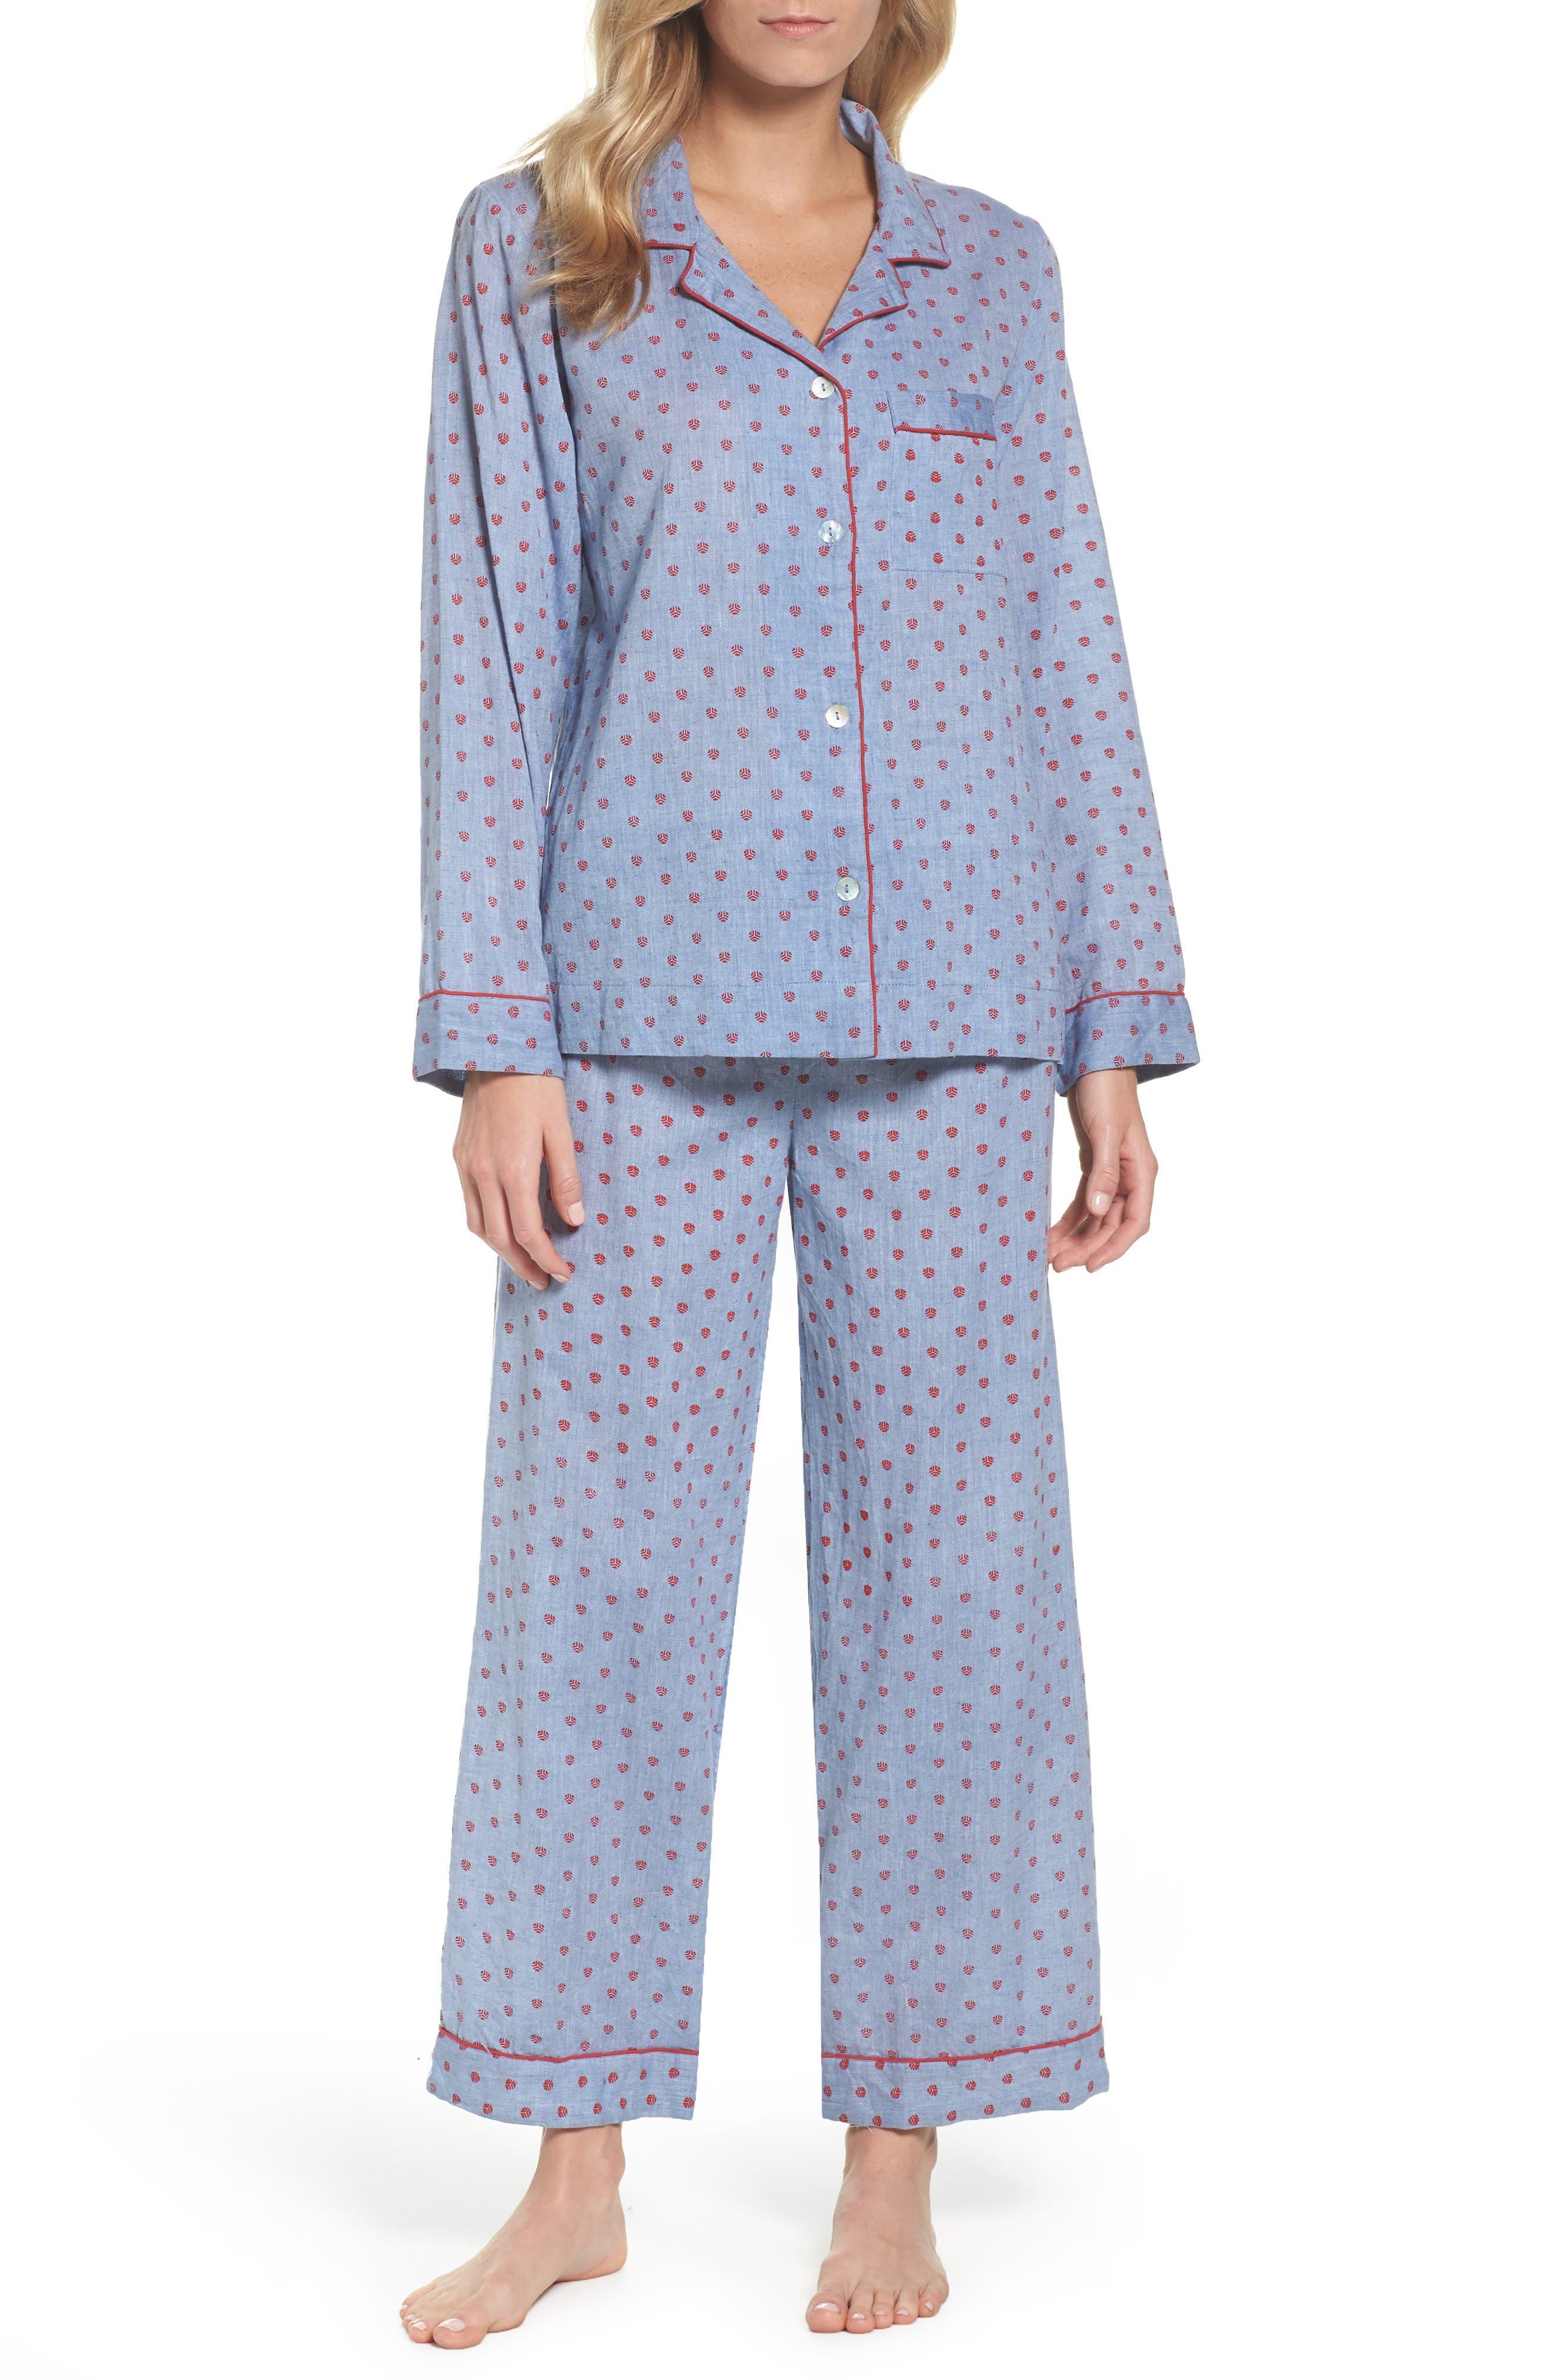 Loungerie Washed Cotton Pajamas